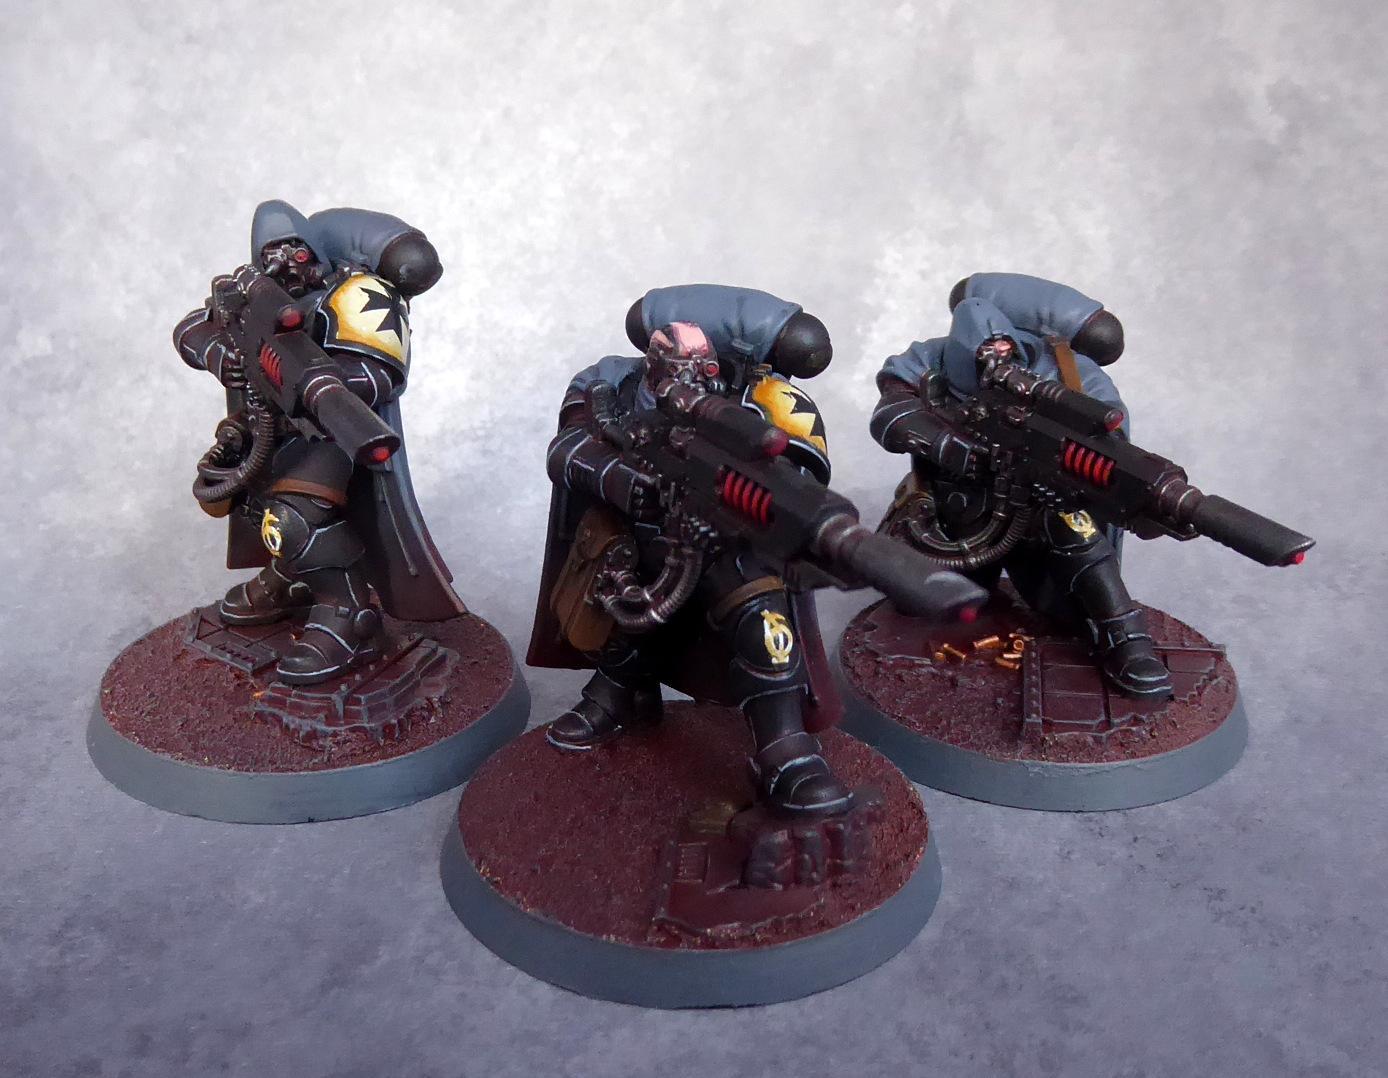 Black Templars, Eliminators, Primaris, Space Marines, Vanguard